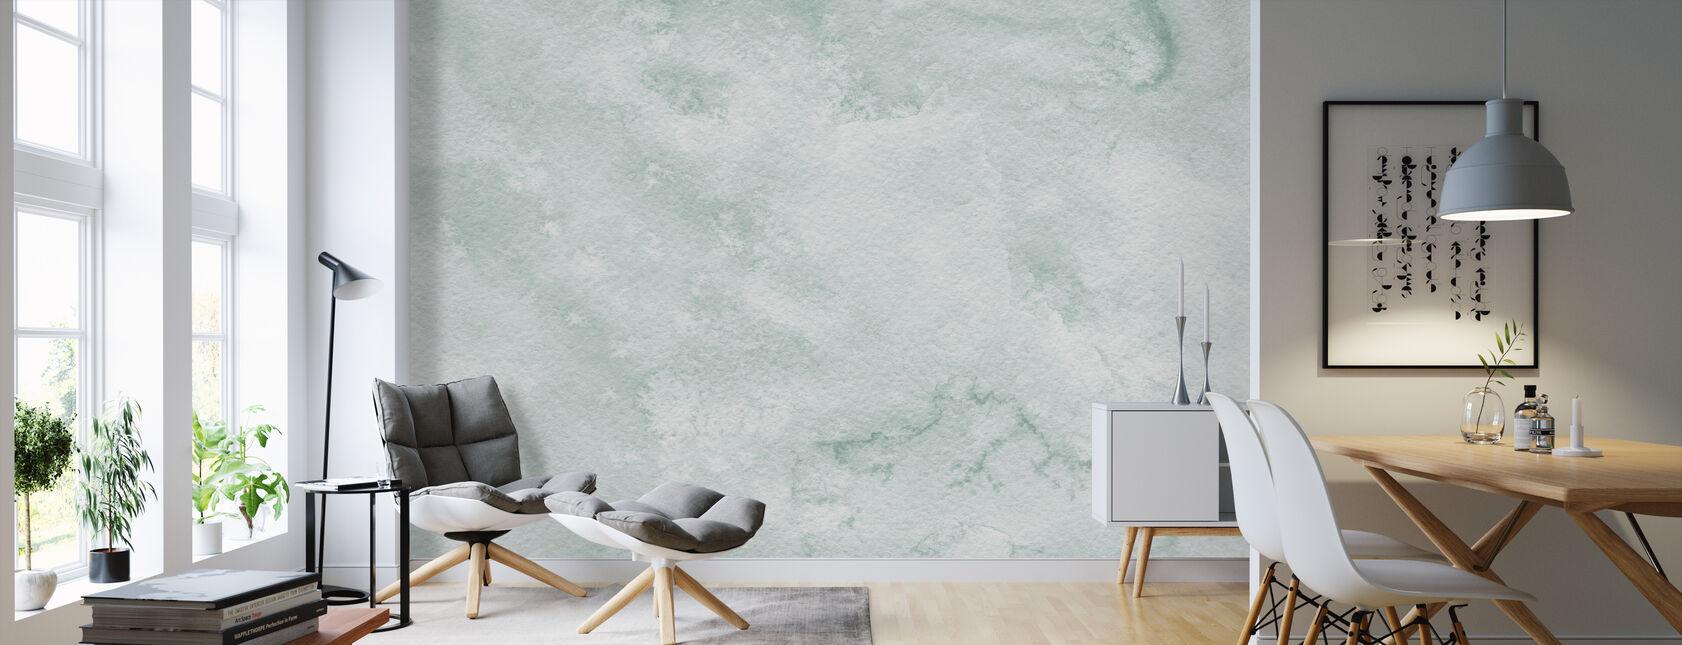 Watercolor Minimalism III - Wallpaper - Living Room